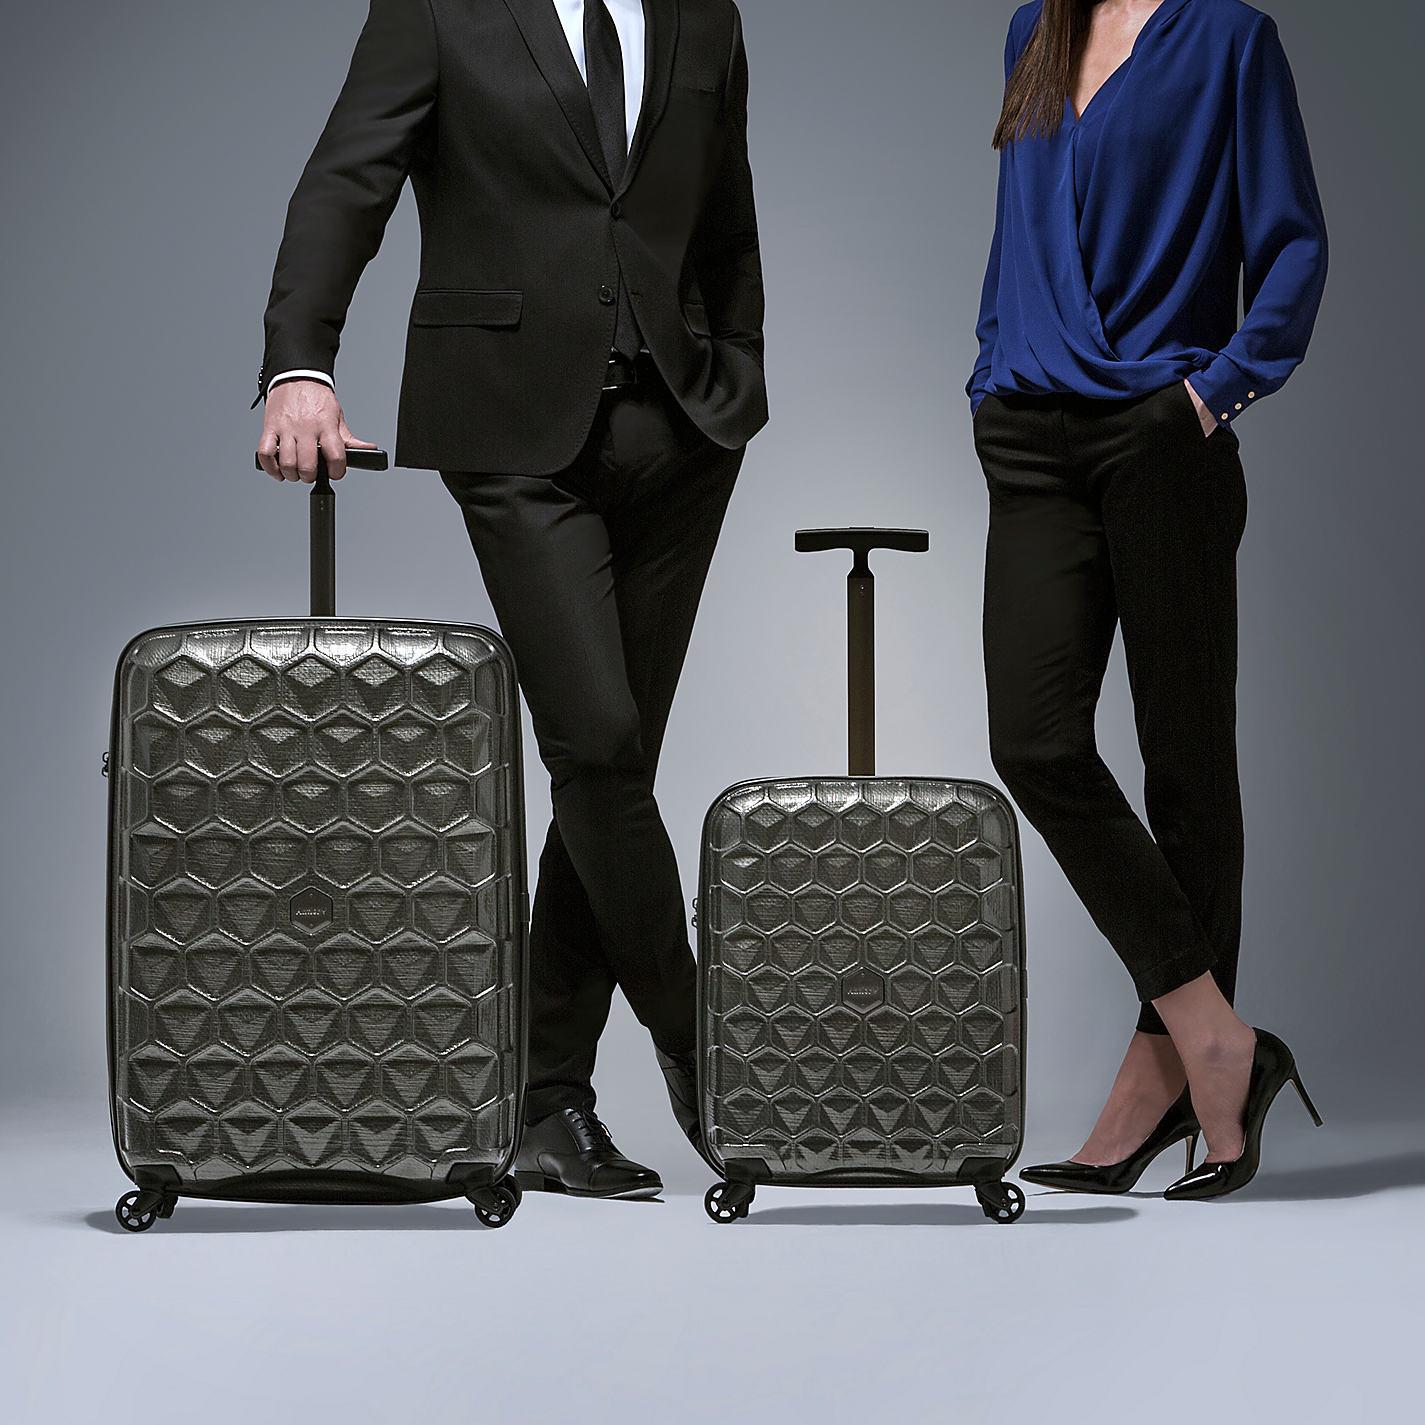 「suitcase fashion」の画像検索結果